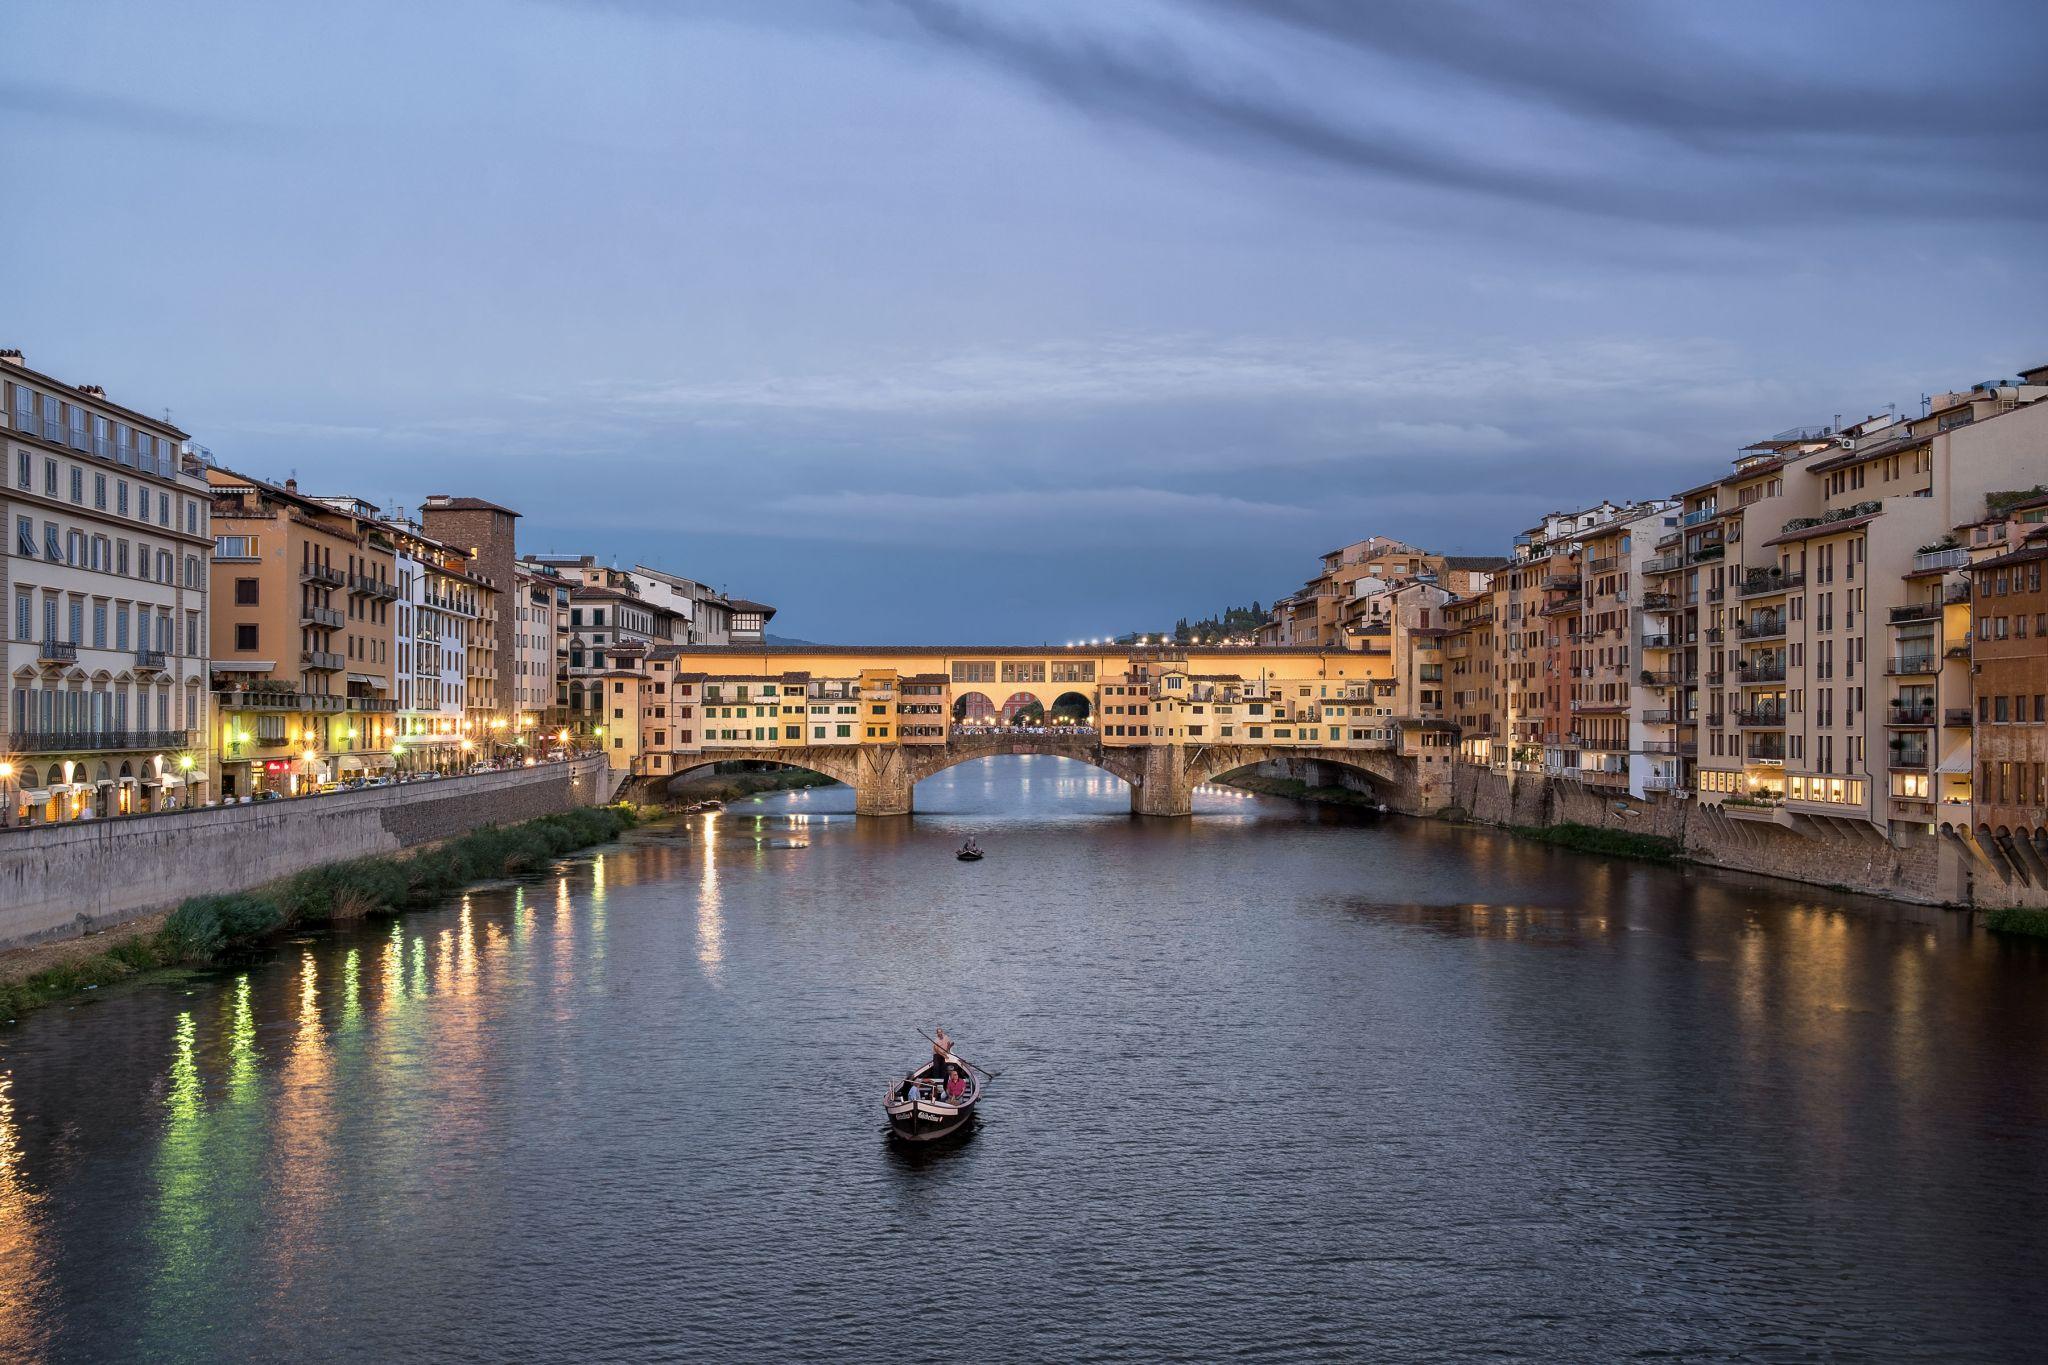 Ponte Vecchio - Old Bridge, Italy